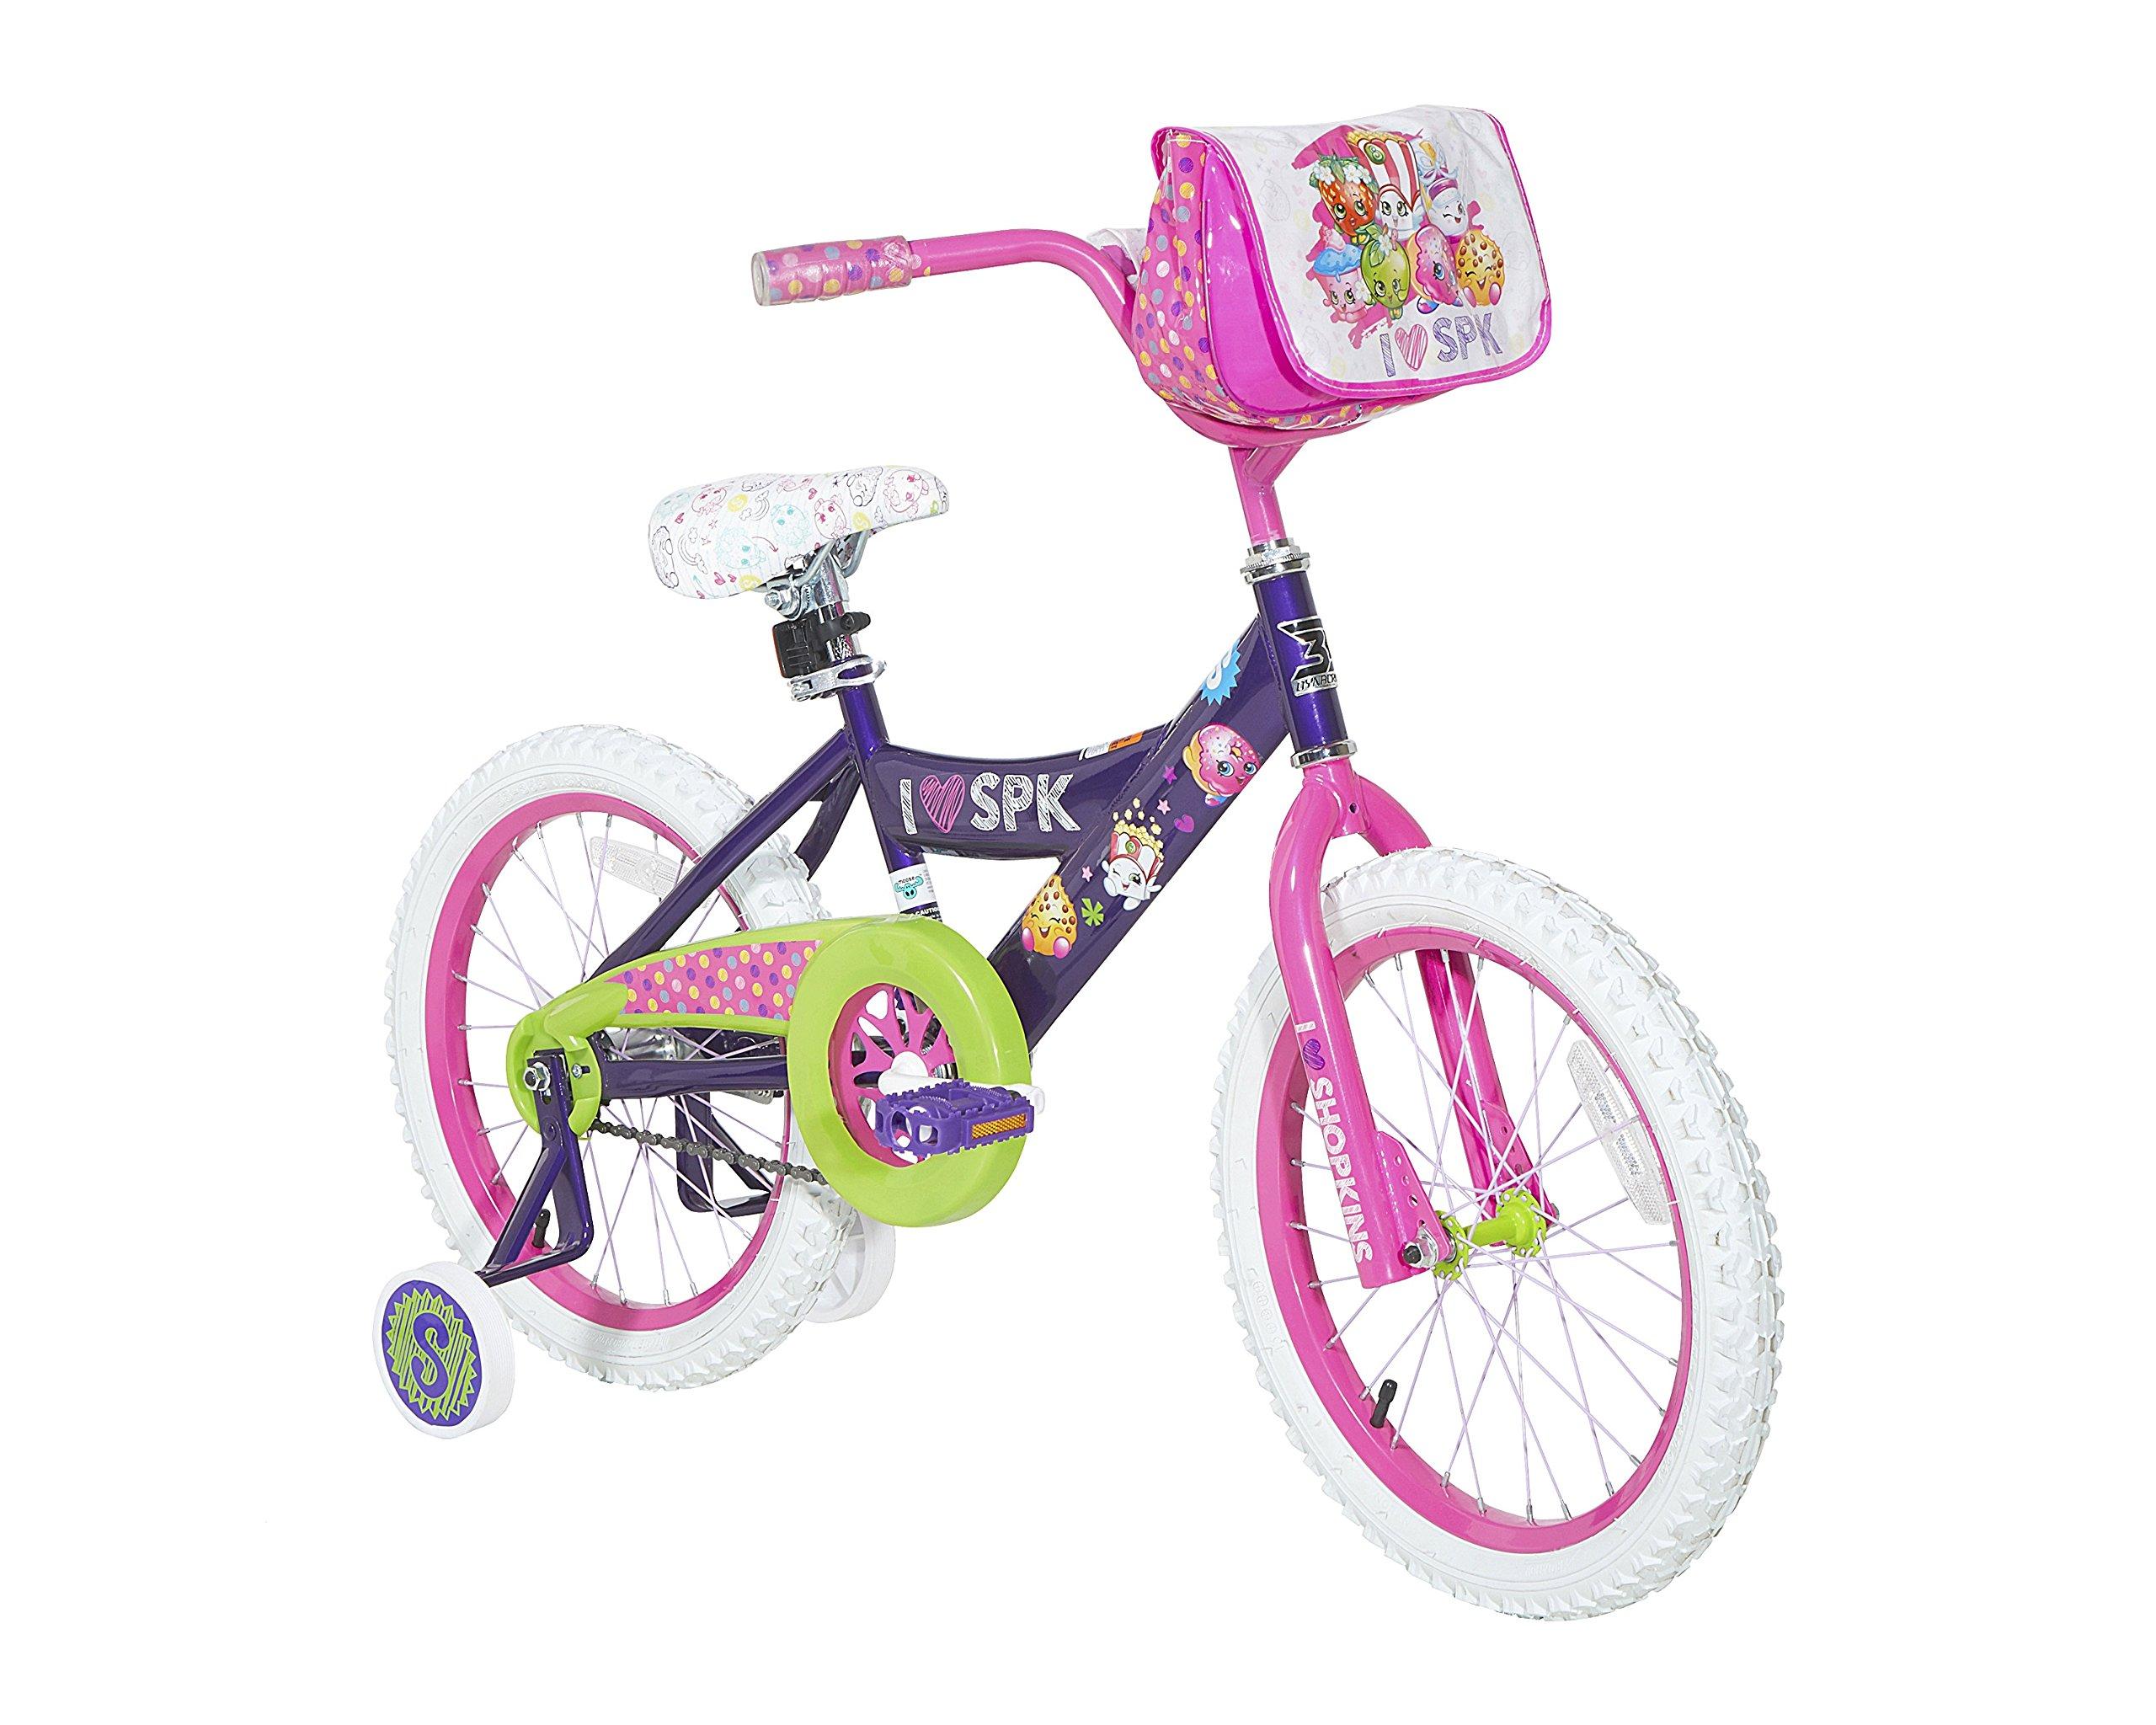 Shopkins Girls Dynacraft Bike, Purple/Pink/Green/White, 18'' by Shopkins (Image #1)